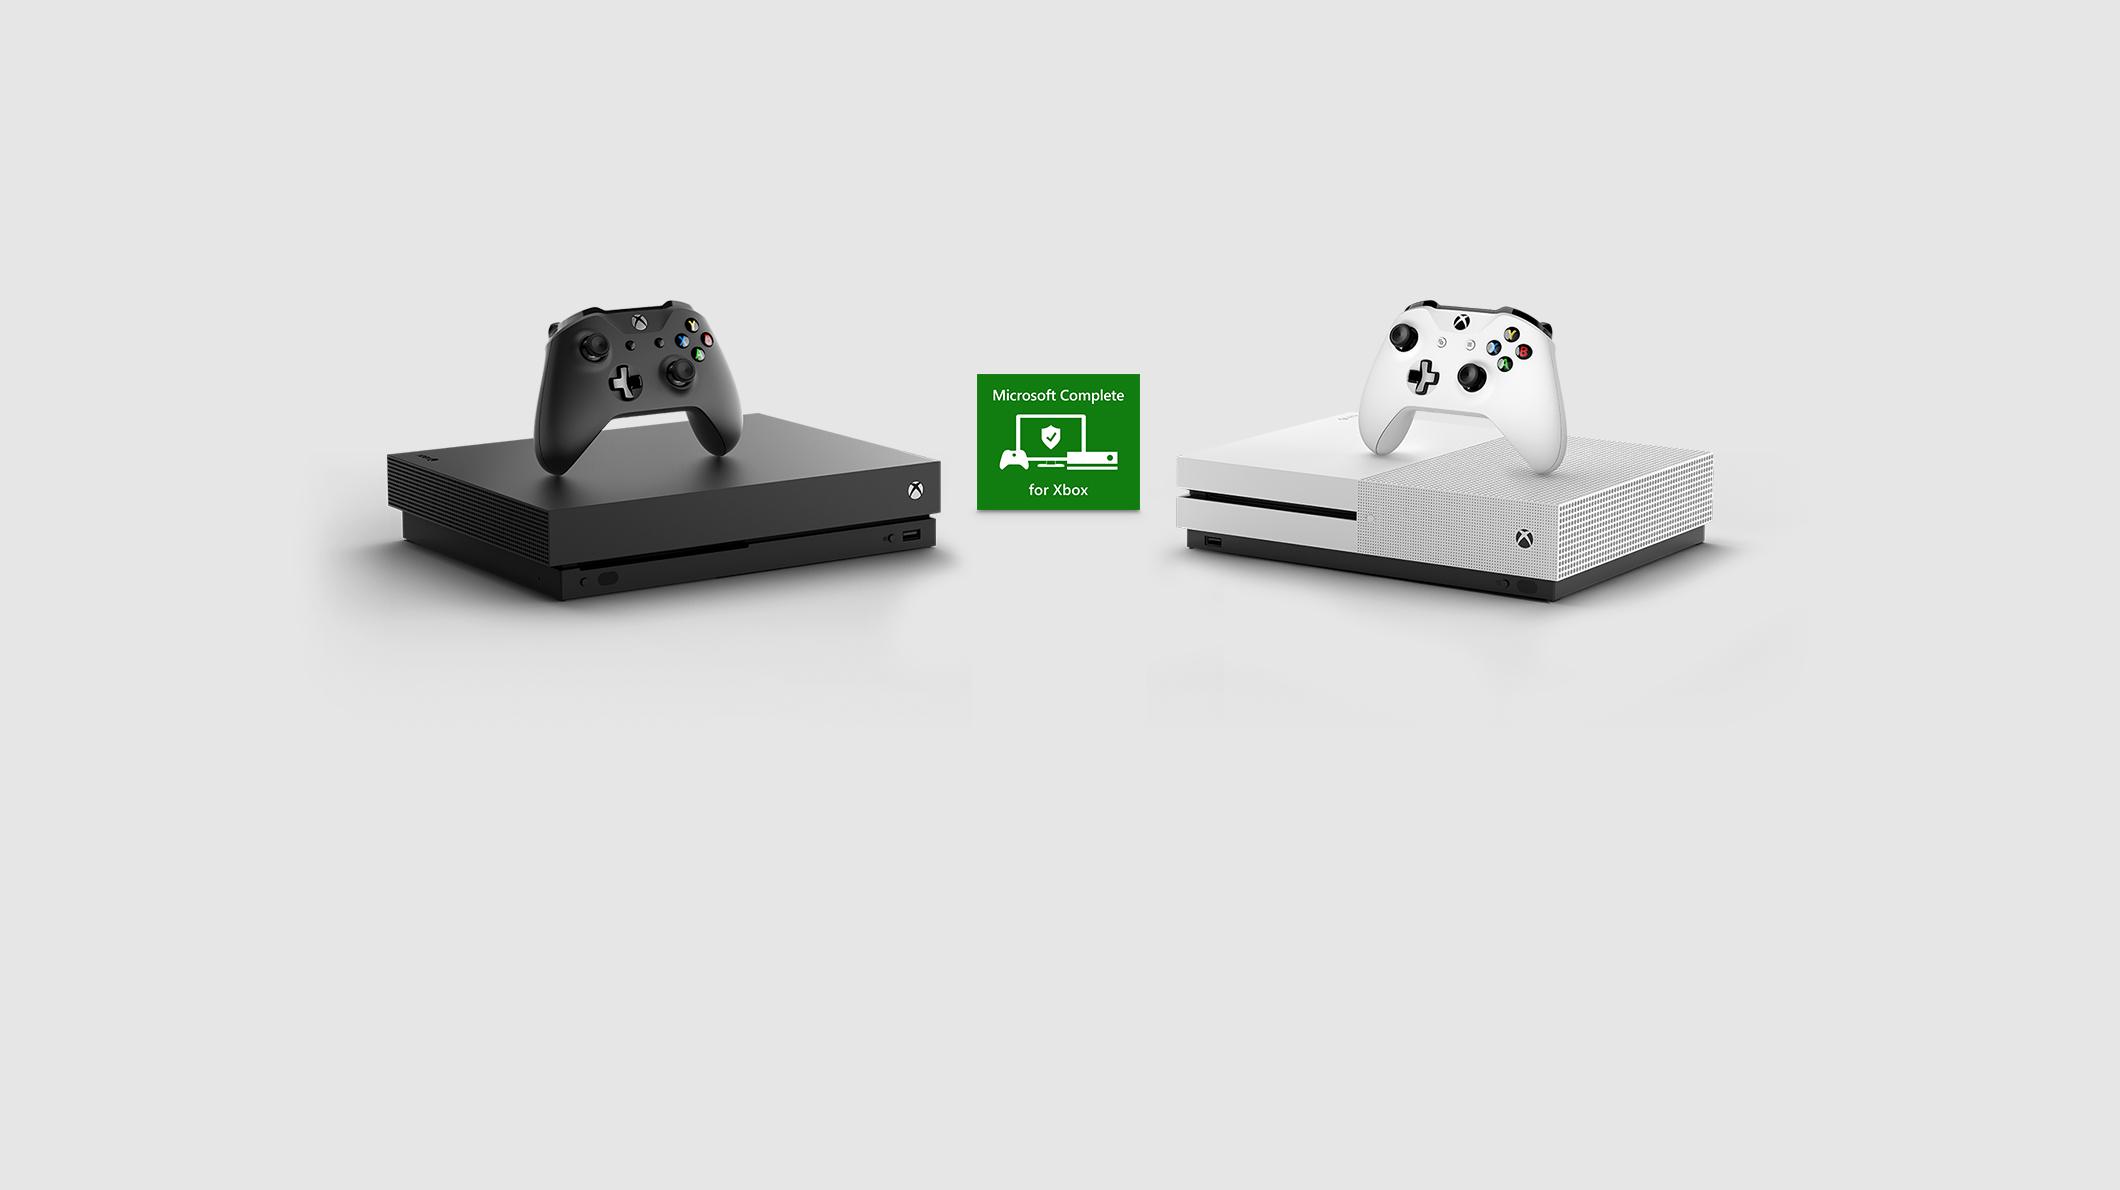 Xbox One consoles, Xbox Complete